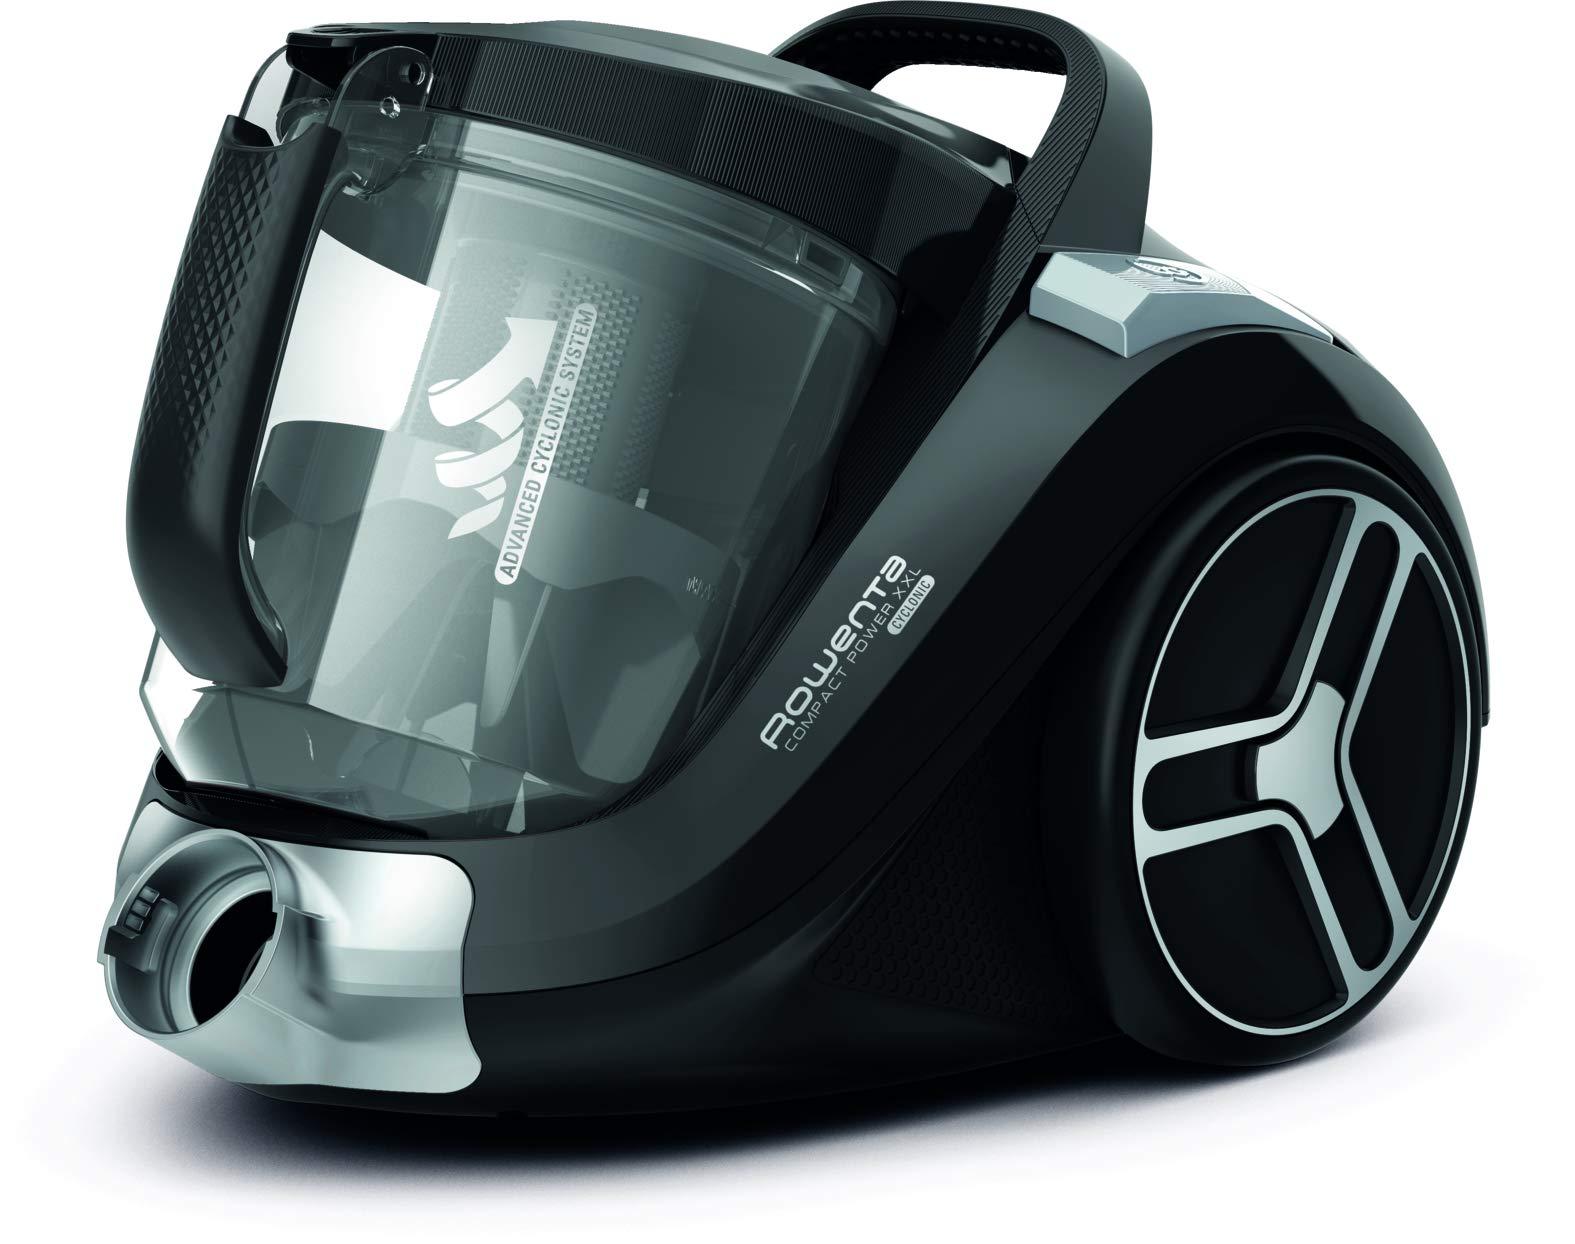 Rowenta Compact Power Cyclonic XL Classic RO4825 Aspiradora de 2.5 l, diseño compacto, motor EffiTech, especial ranuras: Amazon.es: Hogar